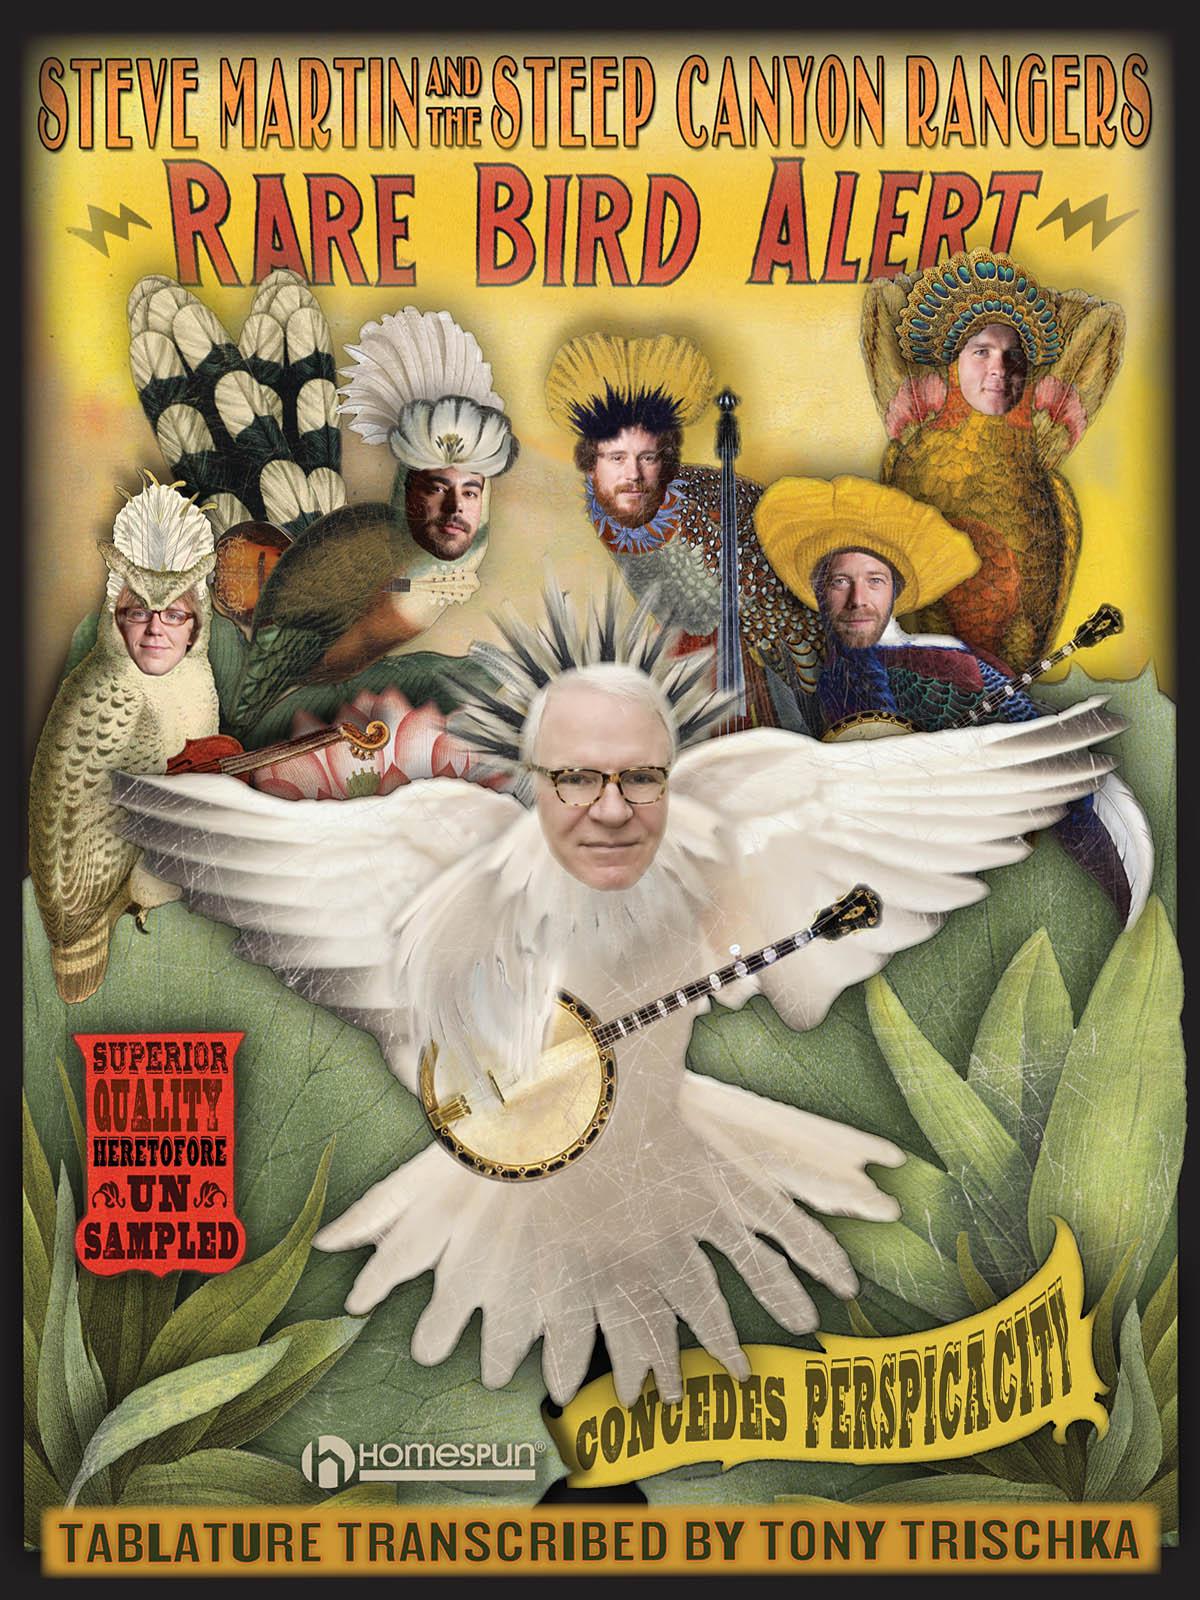 Rare Bird Alert: Banjo: Album Songbook